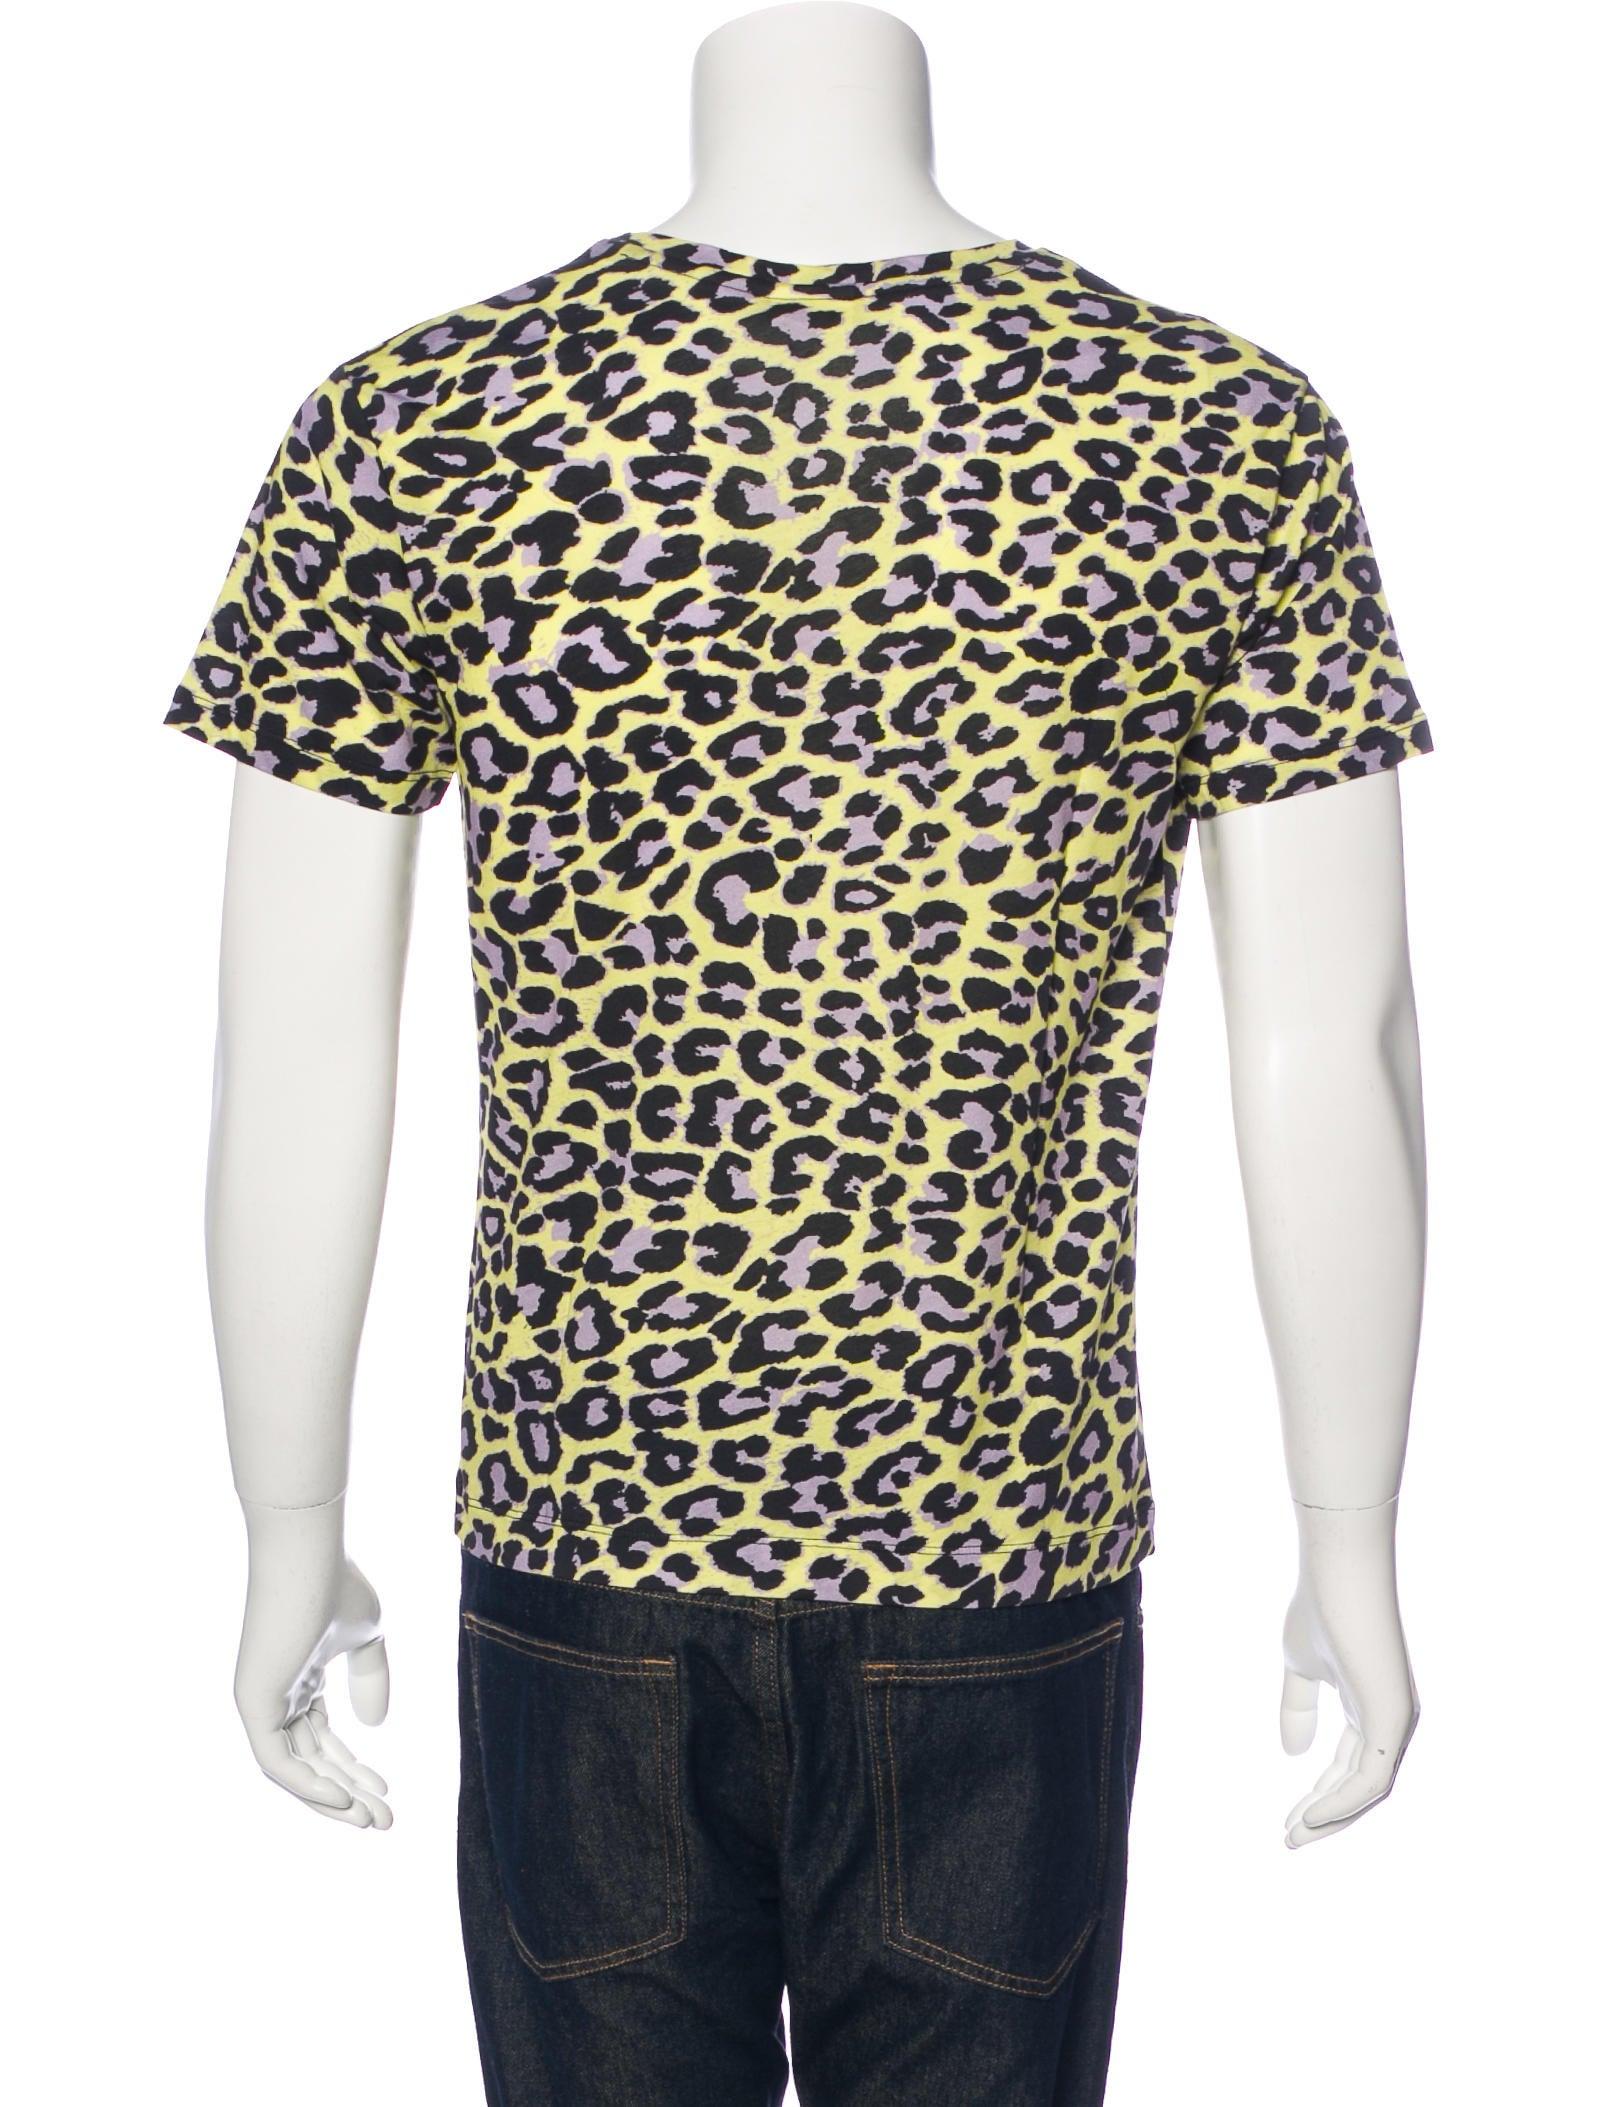 Dries Van Noten Leopard Print T-Shirt w/ Tags - Clothing - DRI38908 | The RealReal